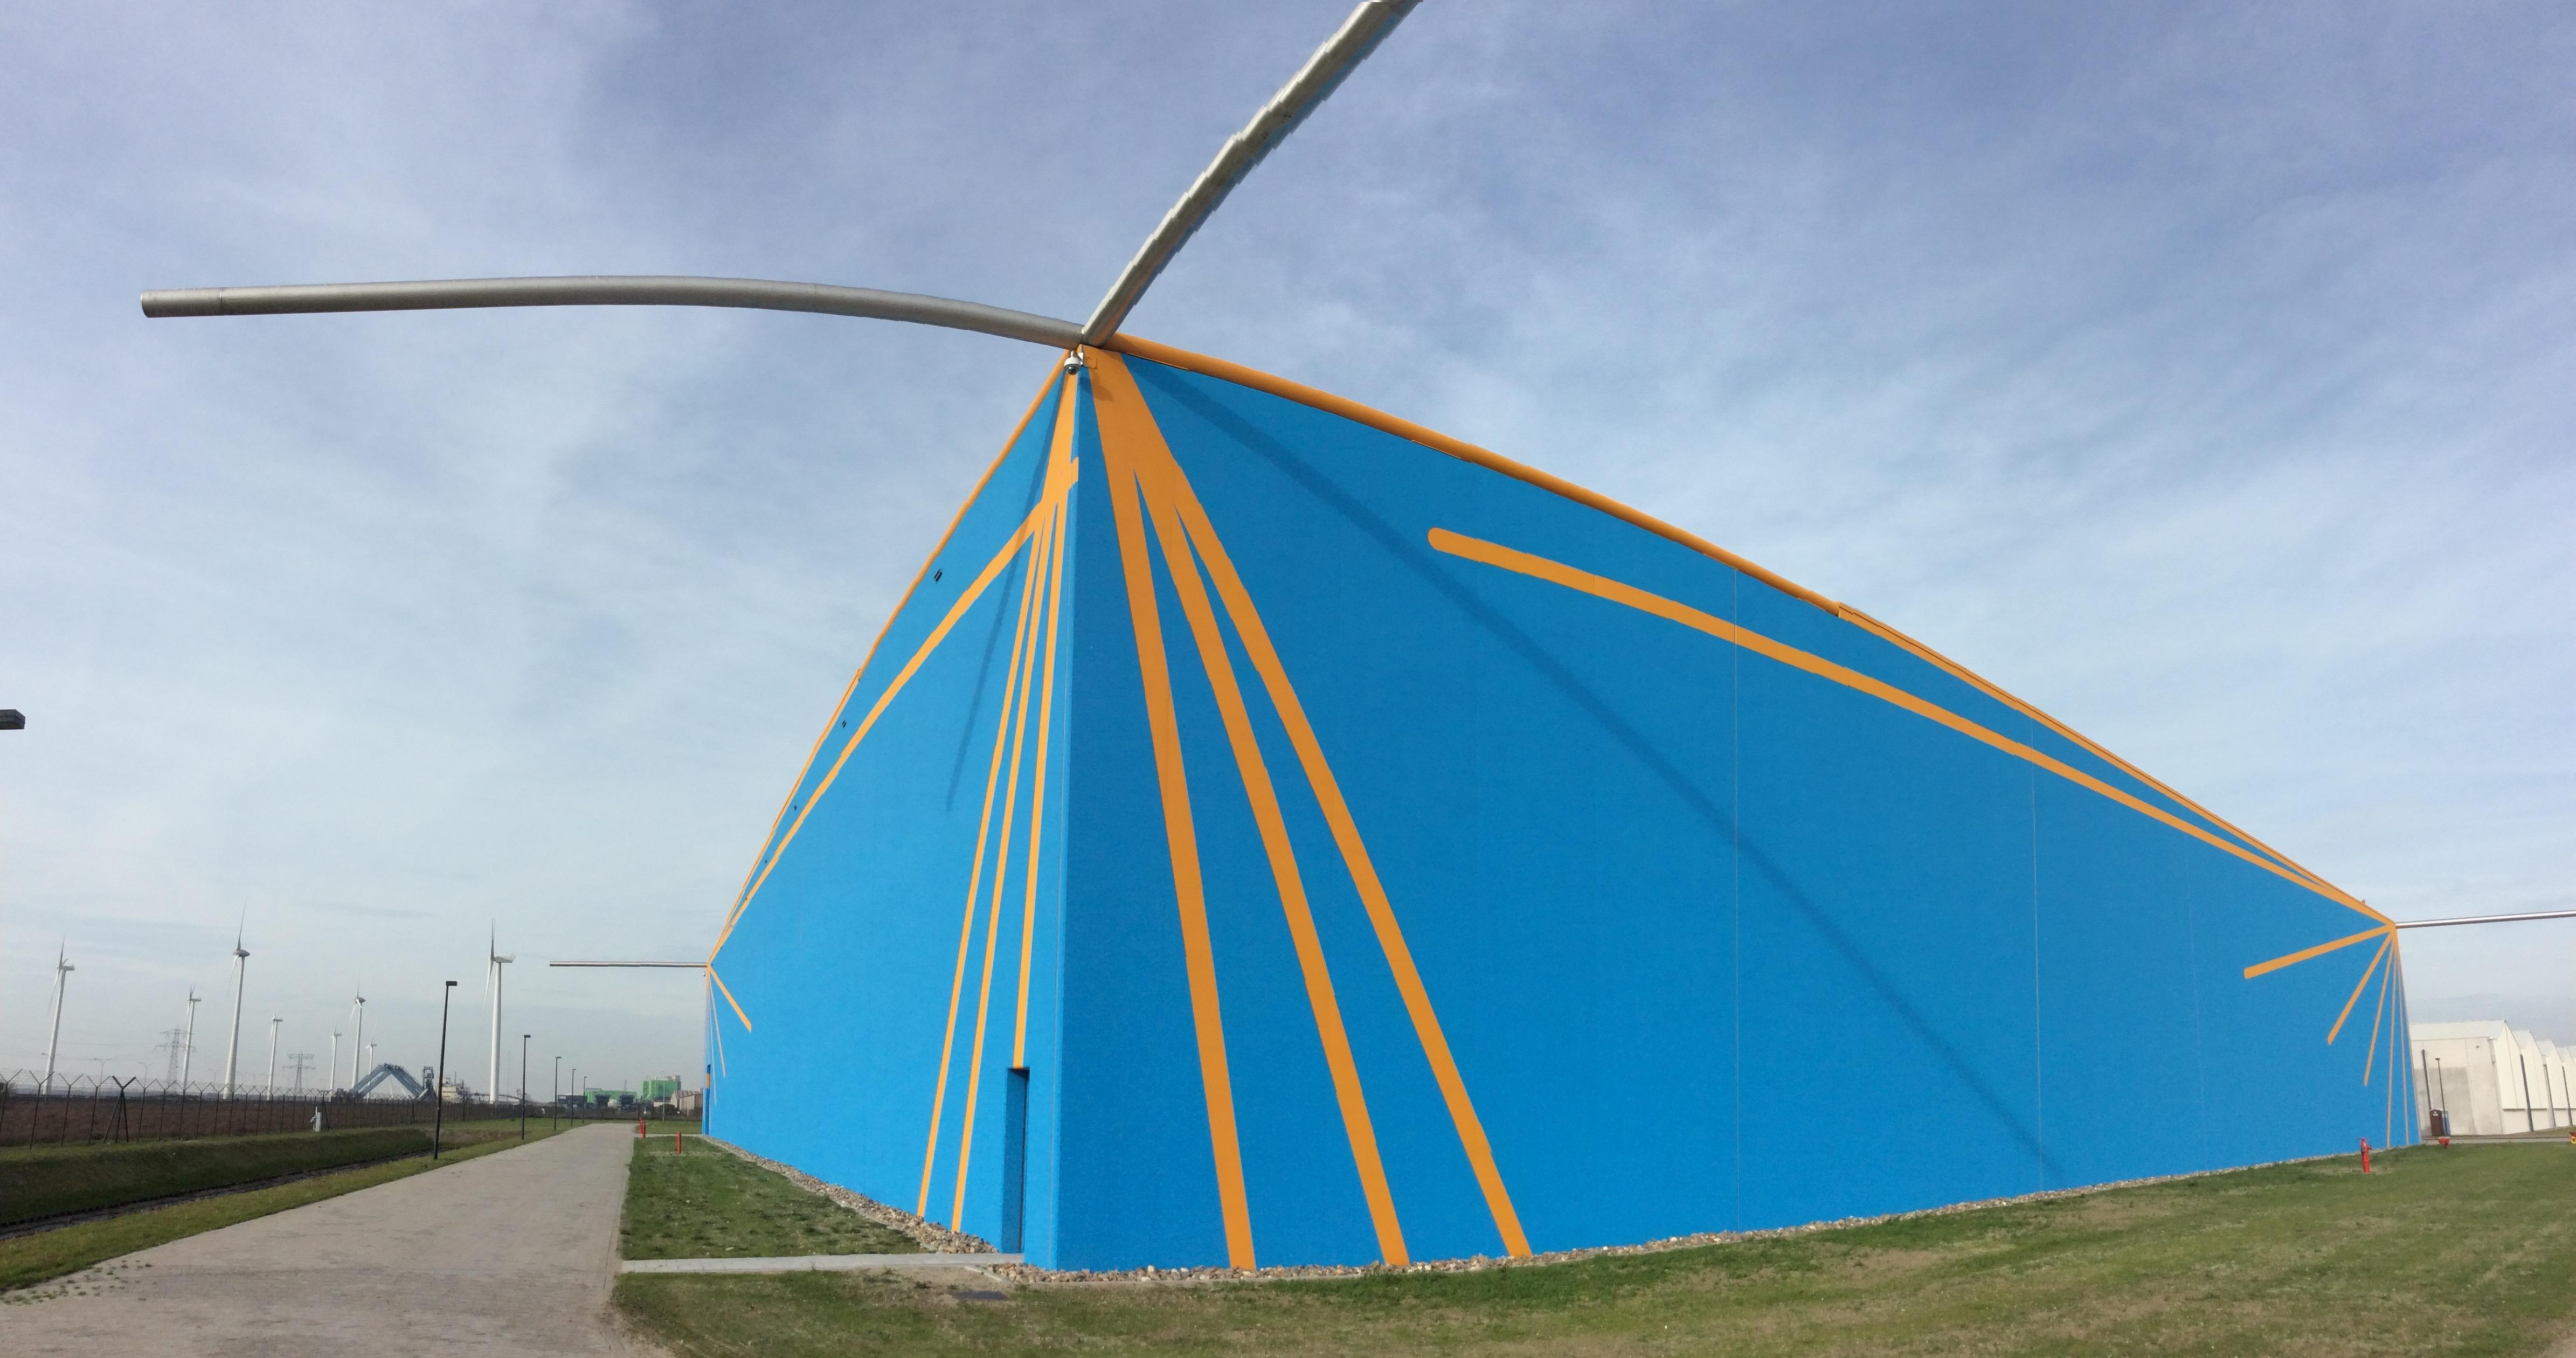 Europe's largest sundial